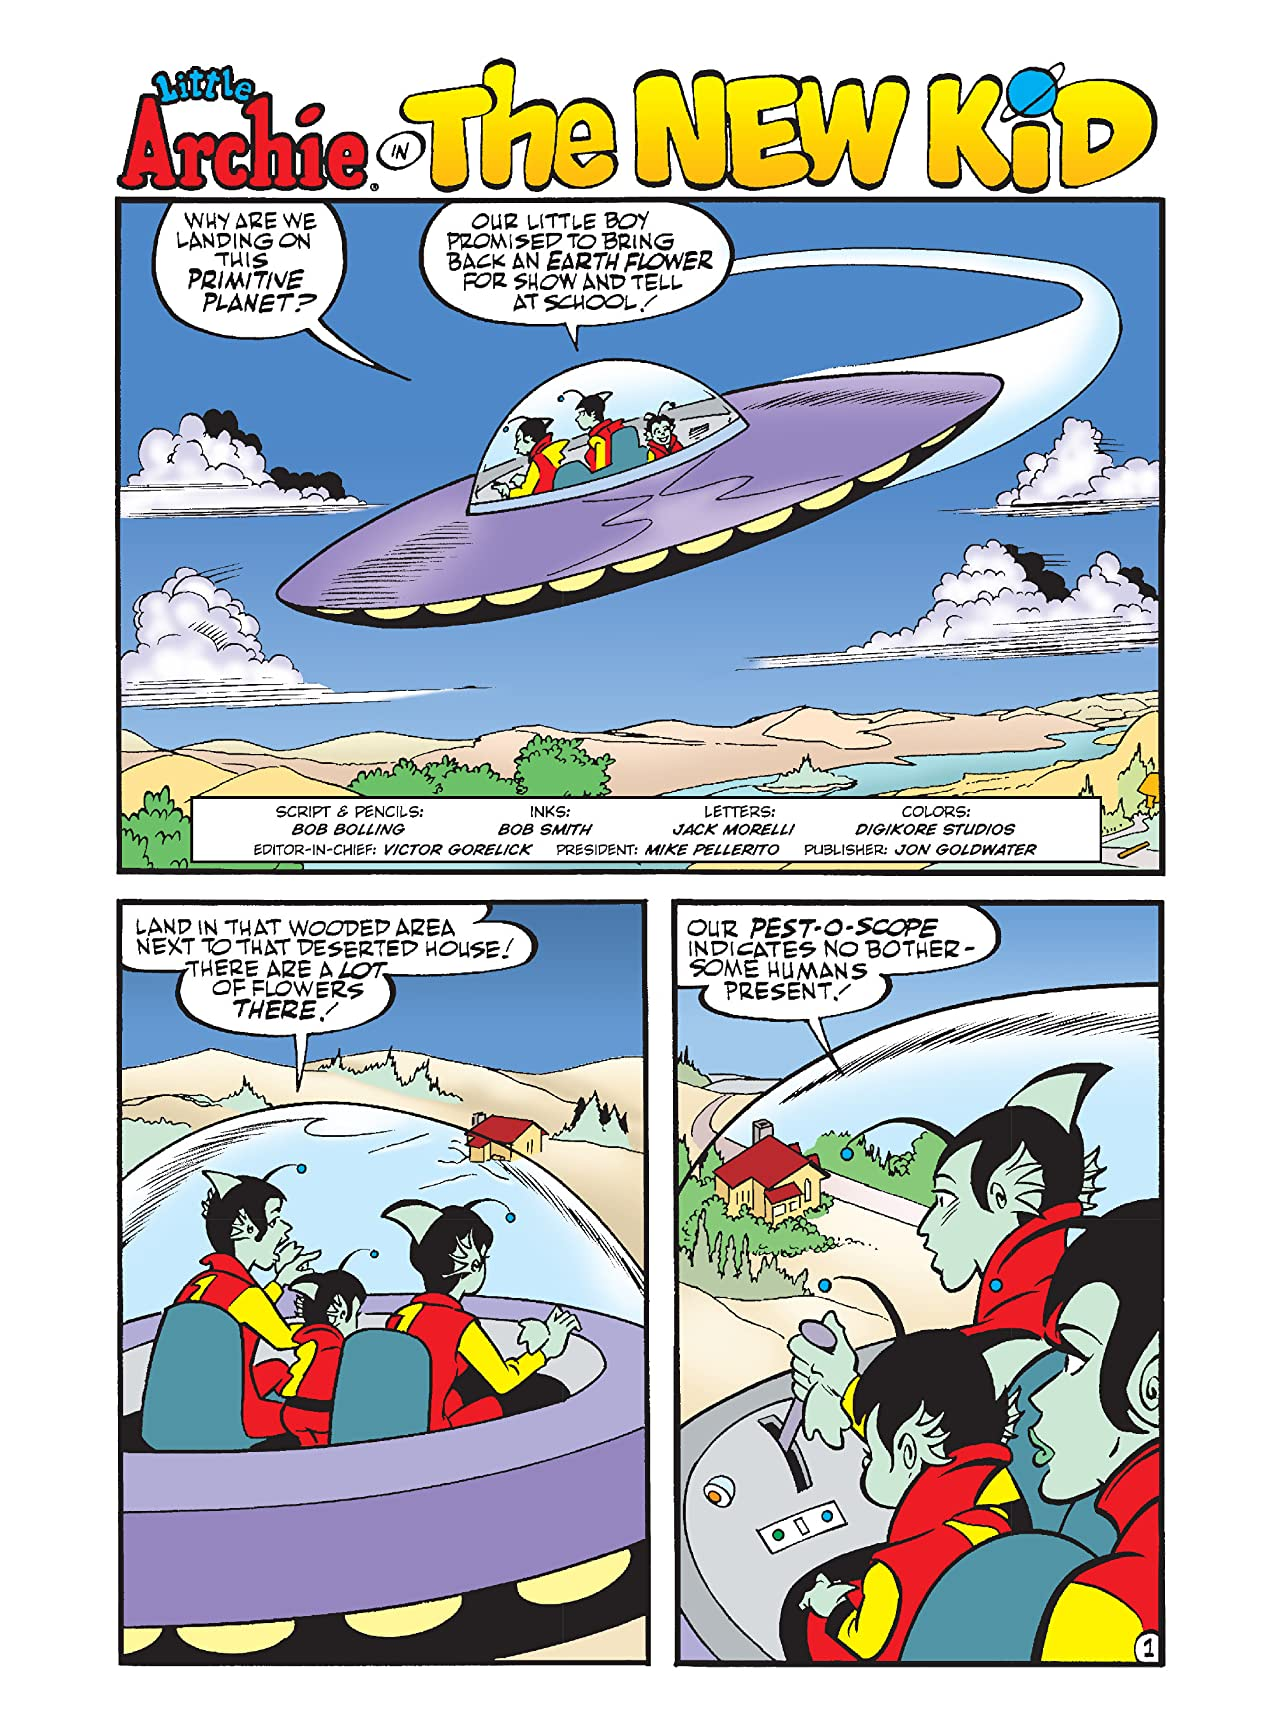 World of Archie Comics Double Digest #47